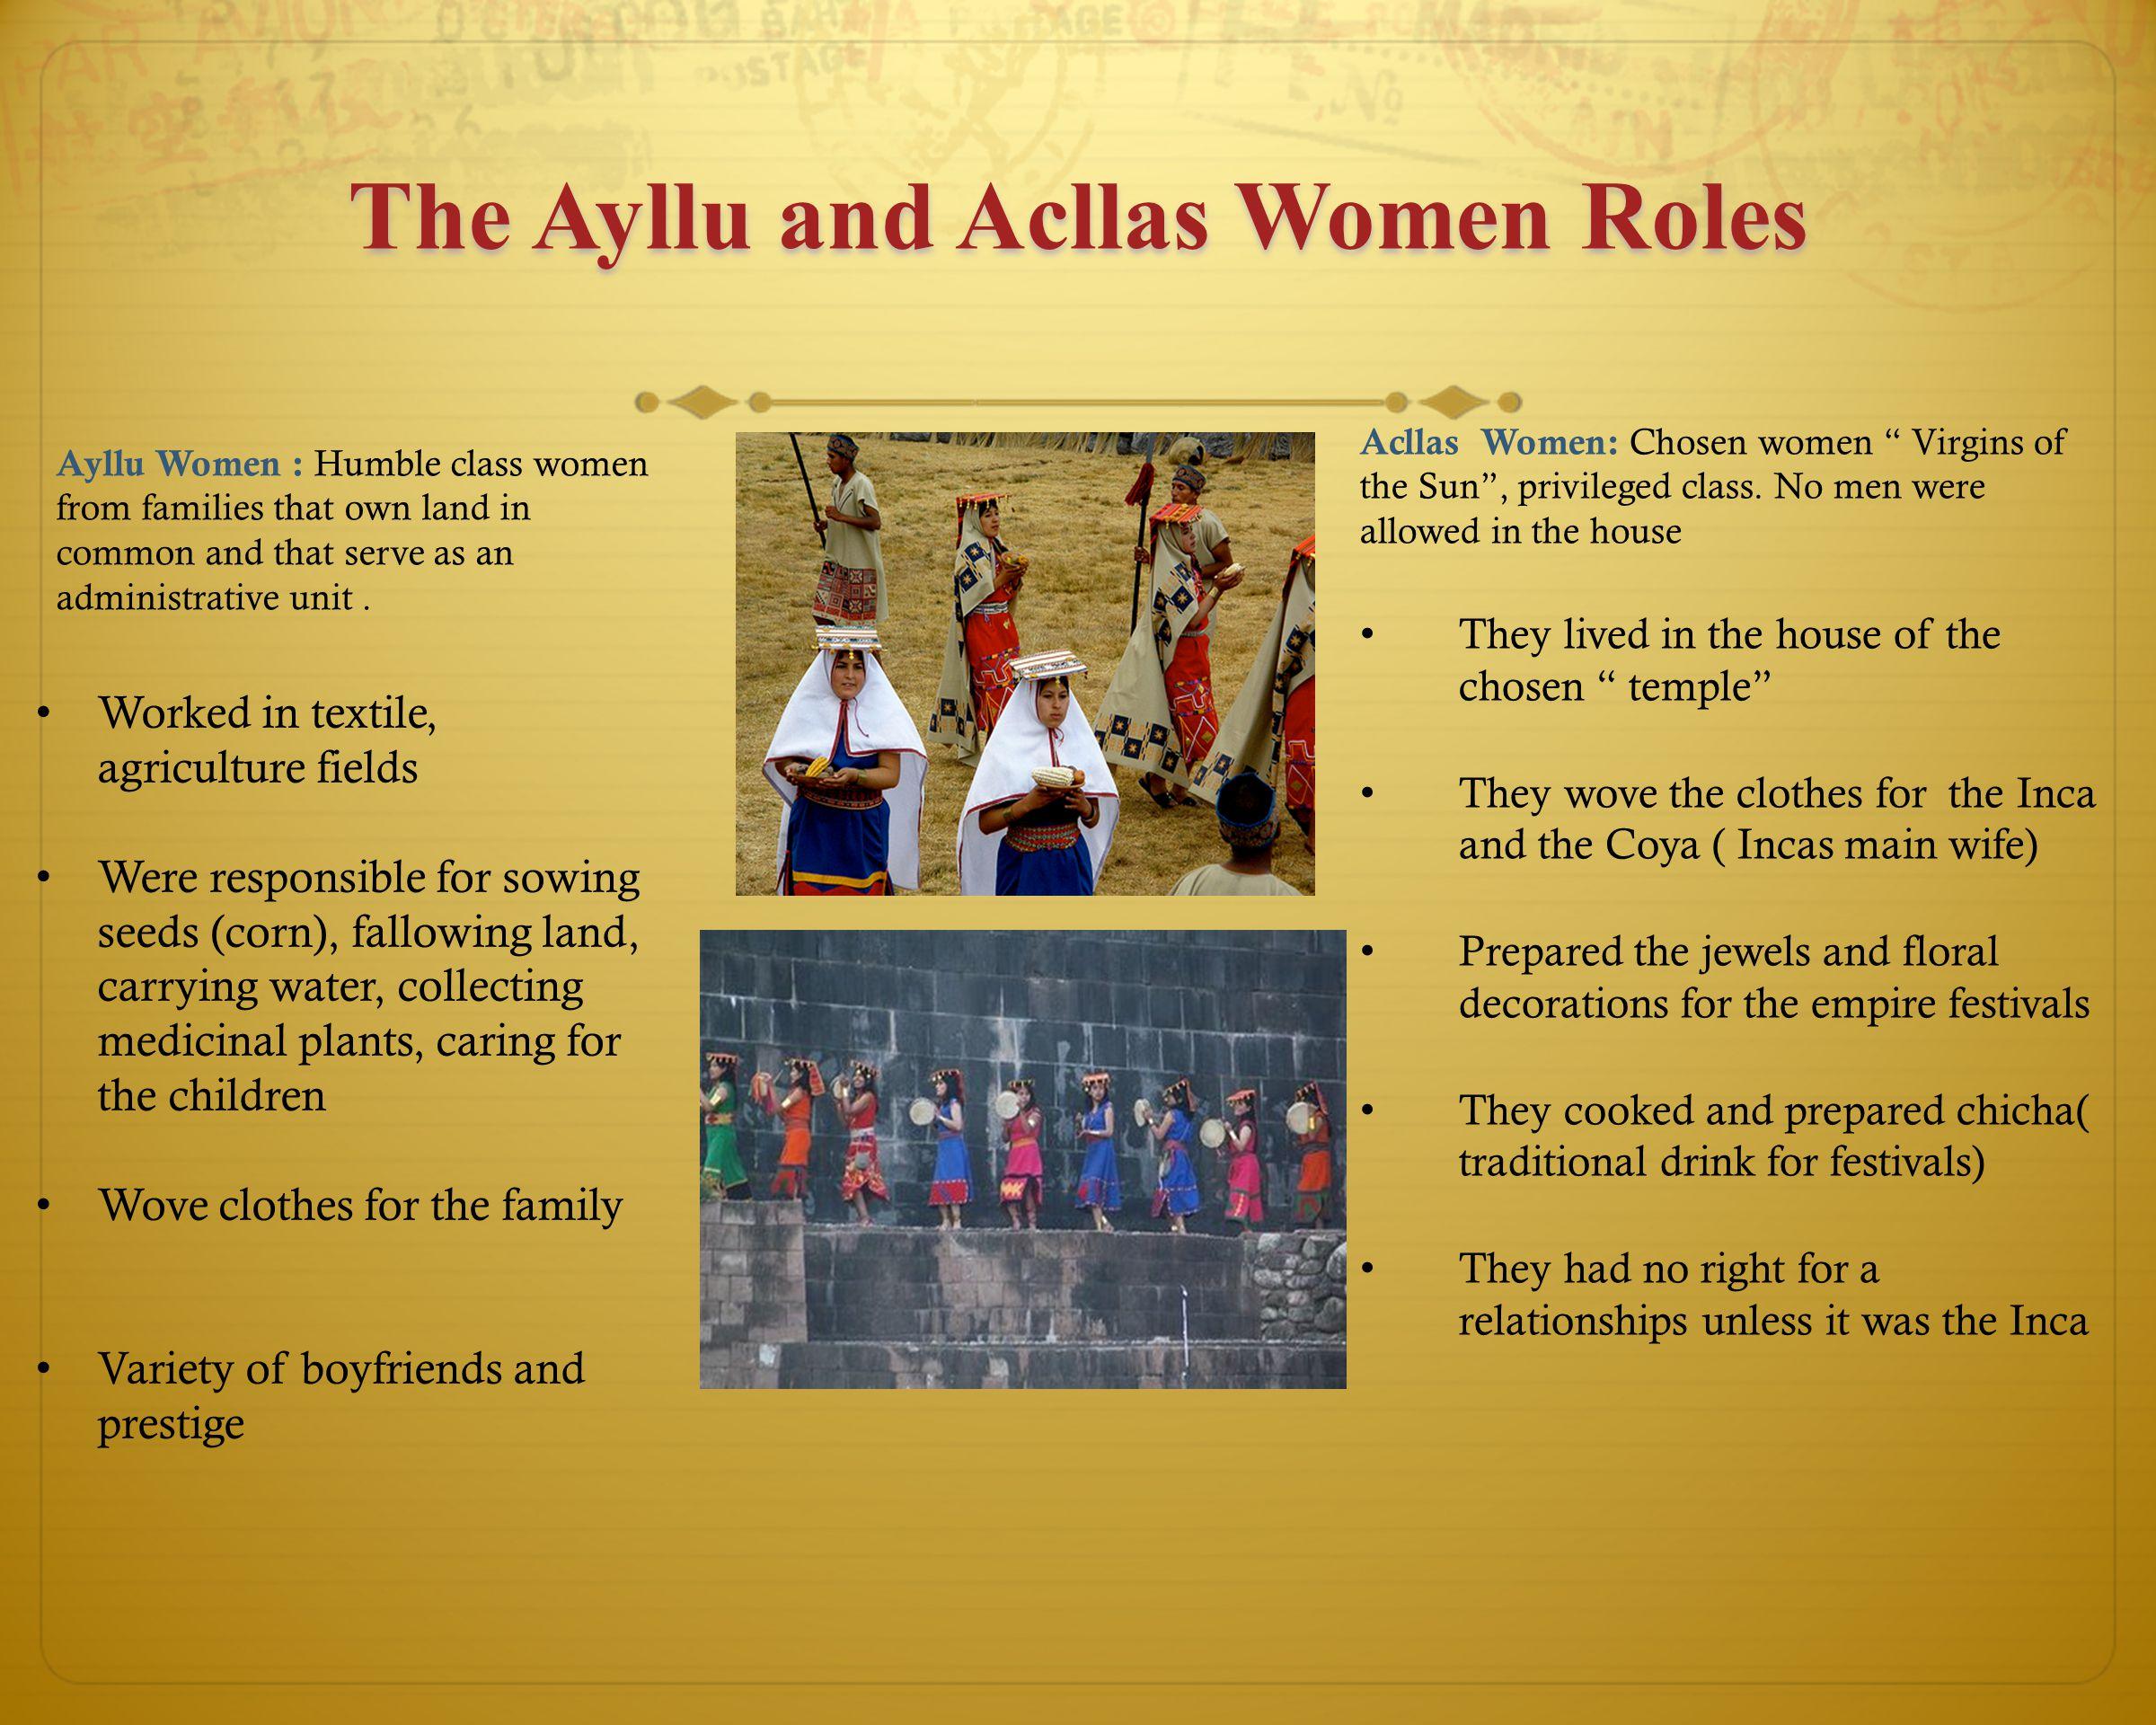 The Ayllu and Acllas Women Roles Acllas Women: Chosen women Virgins of the Sun , privileged class.